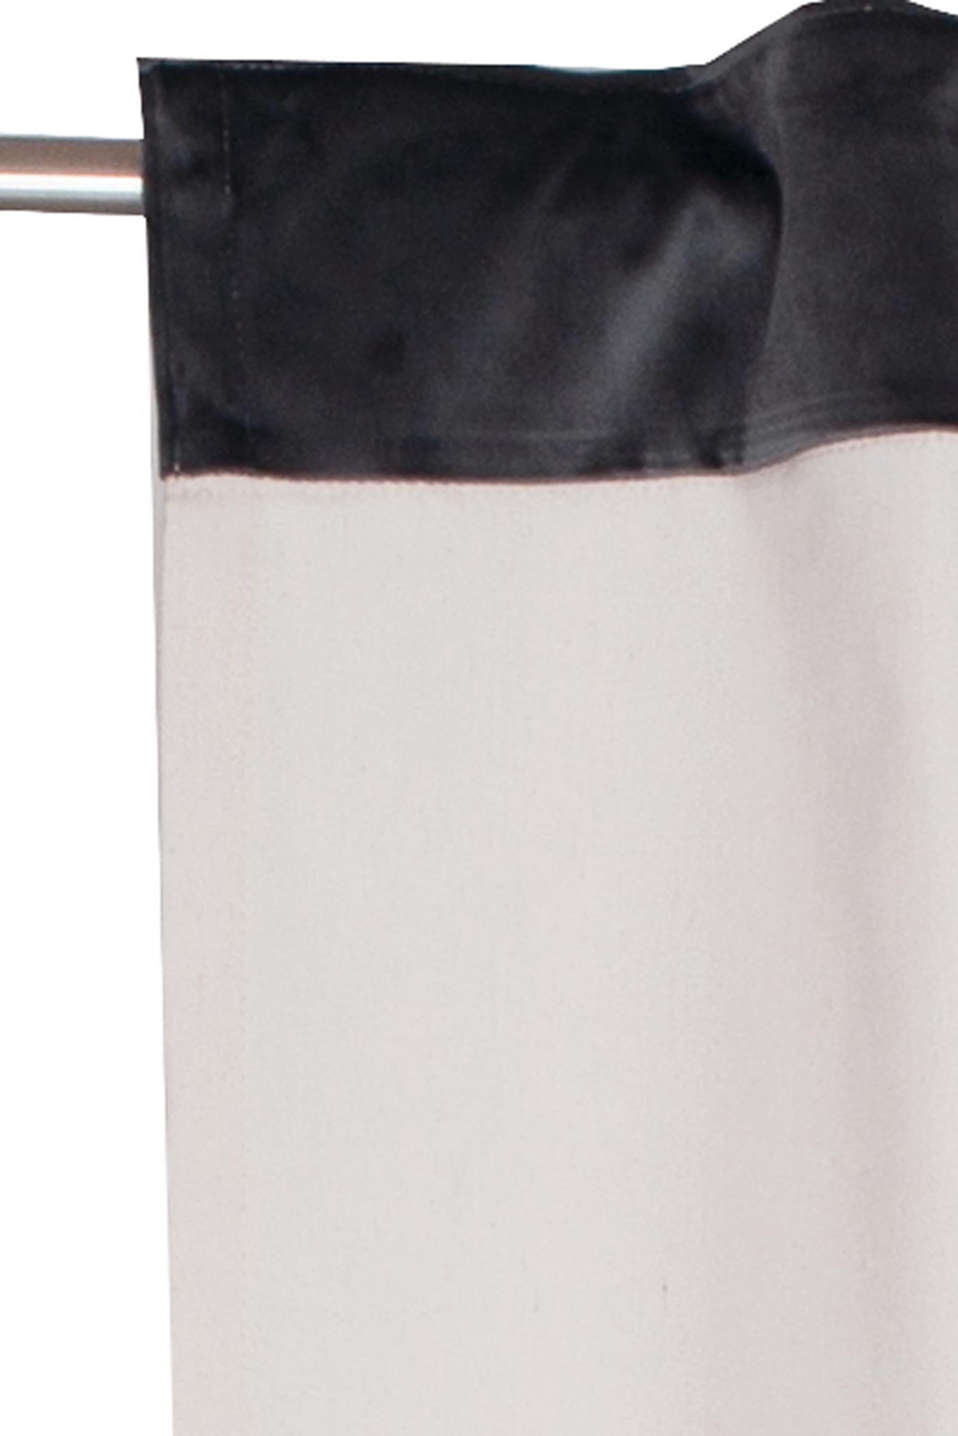 Eyelet curtain with concealed loops, BEIGE/GREY, detail image number 1